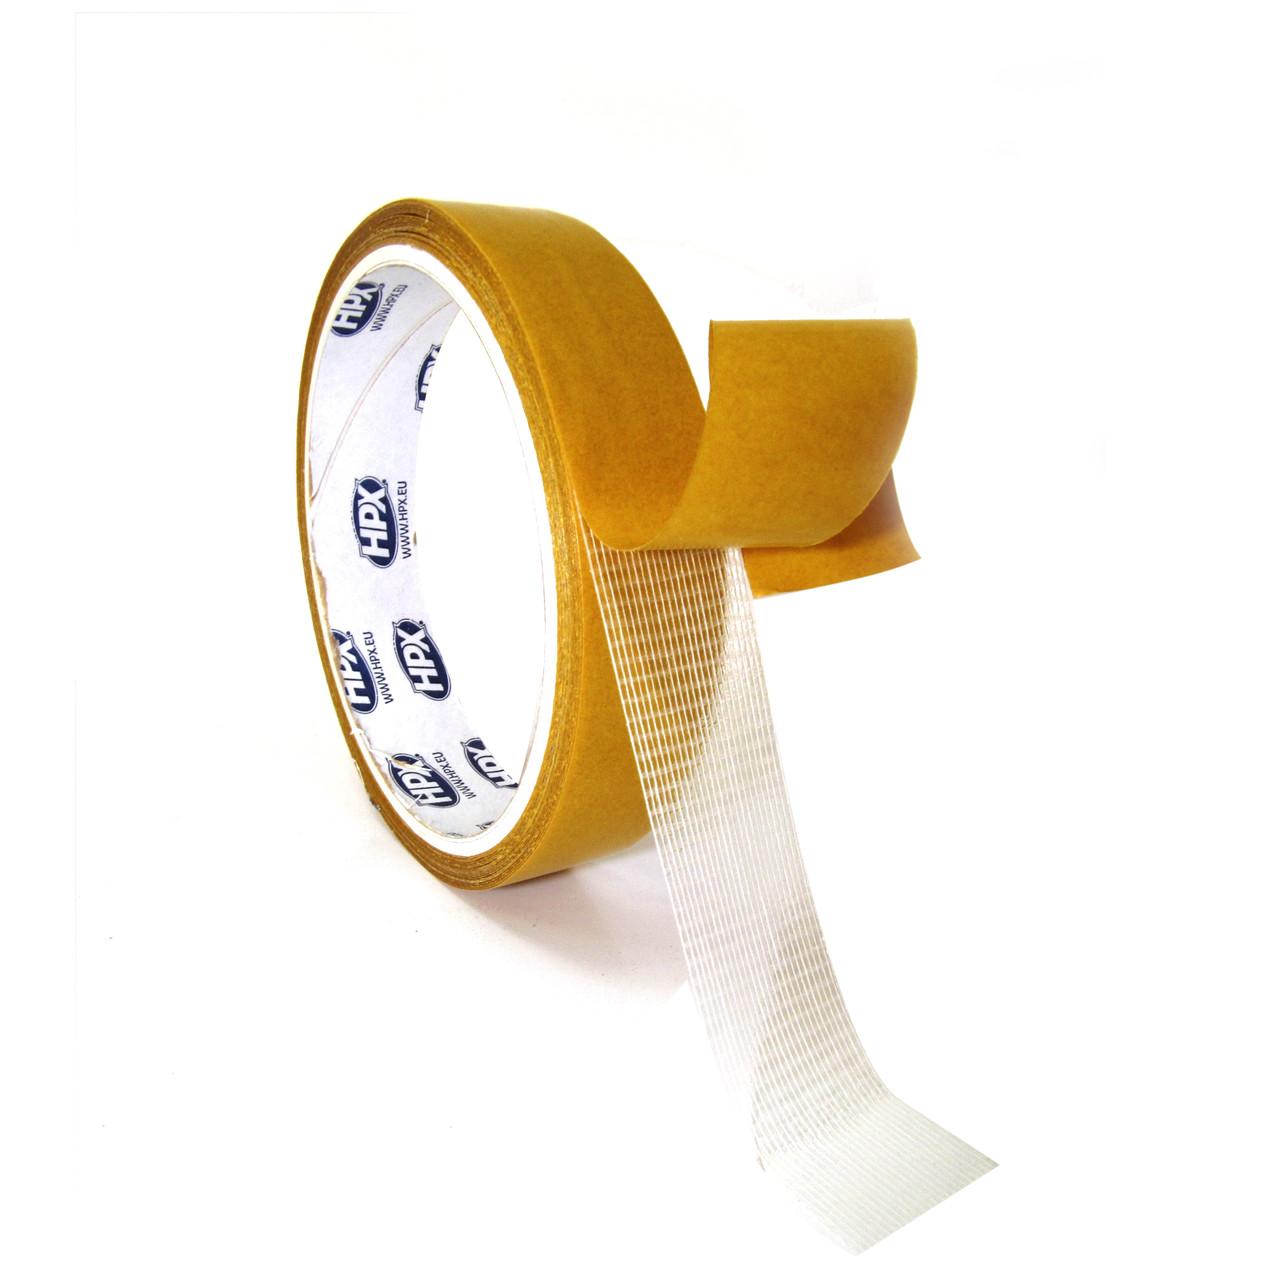 HPX 18220 - тканевая двухсторонняя клеящая лента (скотч) для тяжелых нагрузок